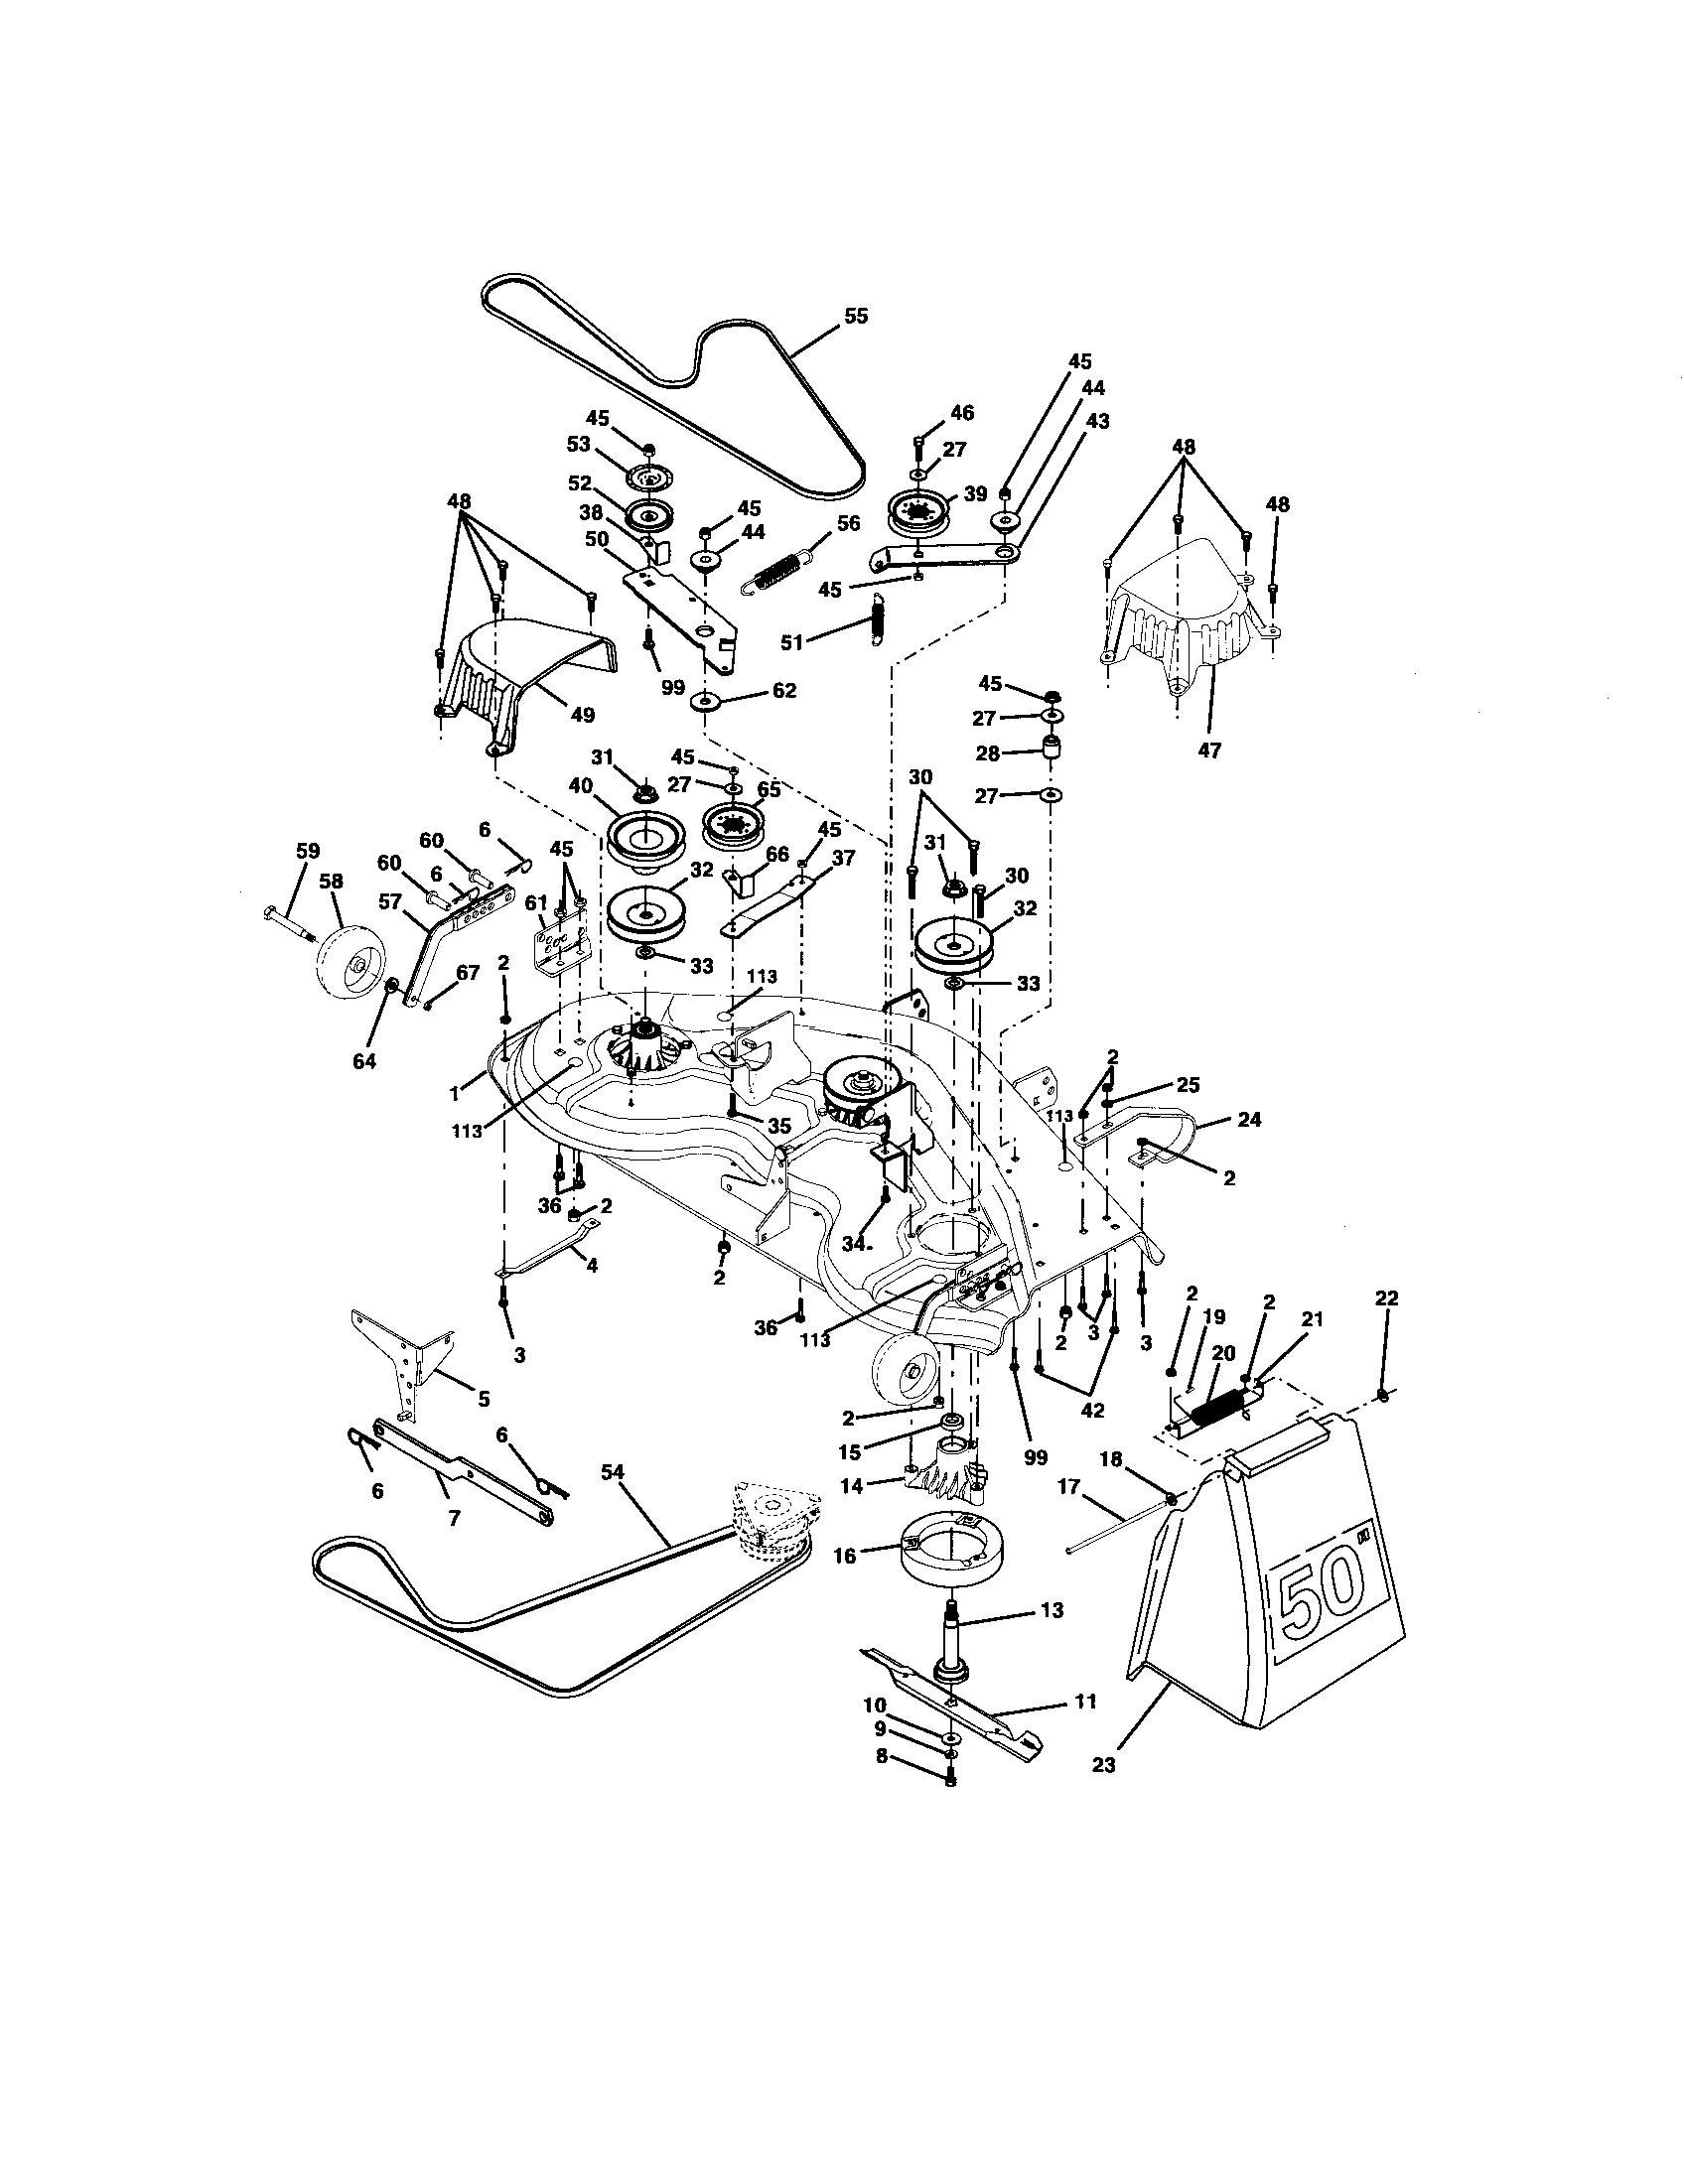 Craftsman Gt5000 Drive Belt Diagram : craftsman, gt5000, drive, diagram, Craftsman, 917276051, Front-engine, Tractor, Parts, Sears, PartsDirect